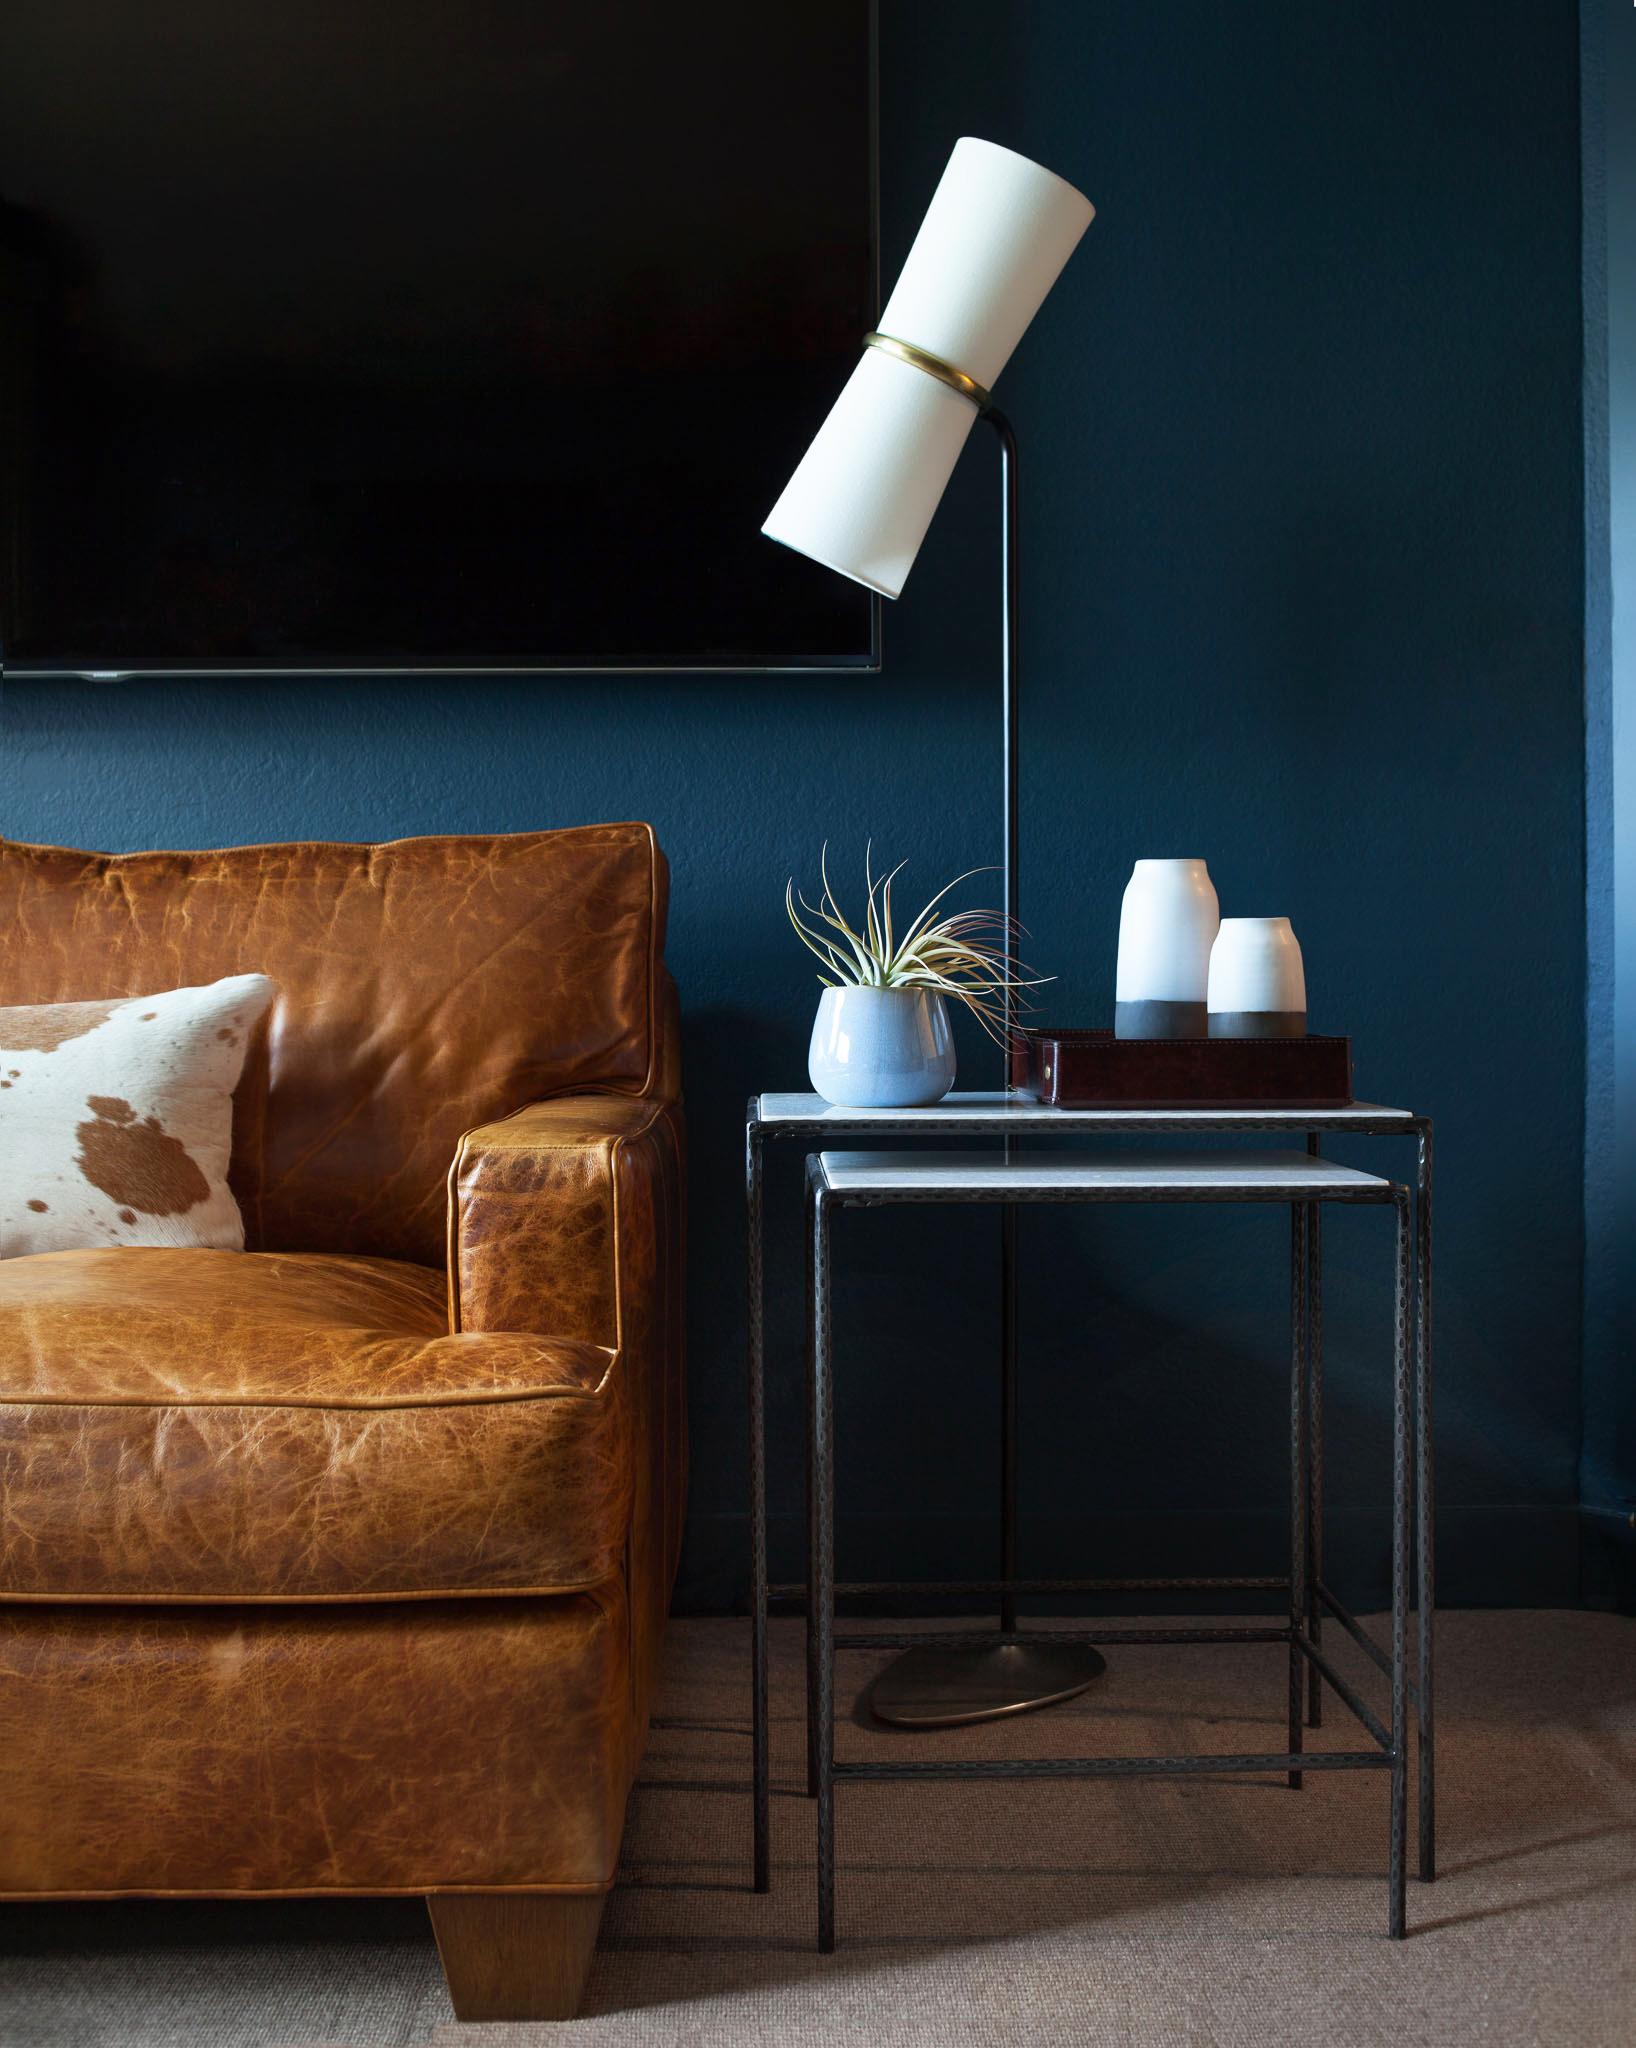 his-sofa-detail.jpg